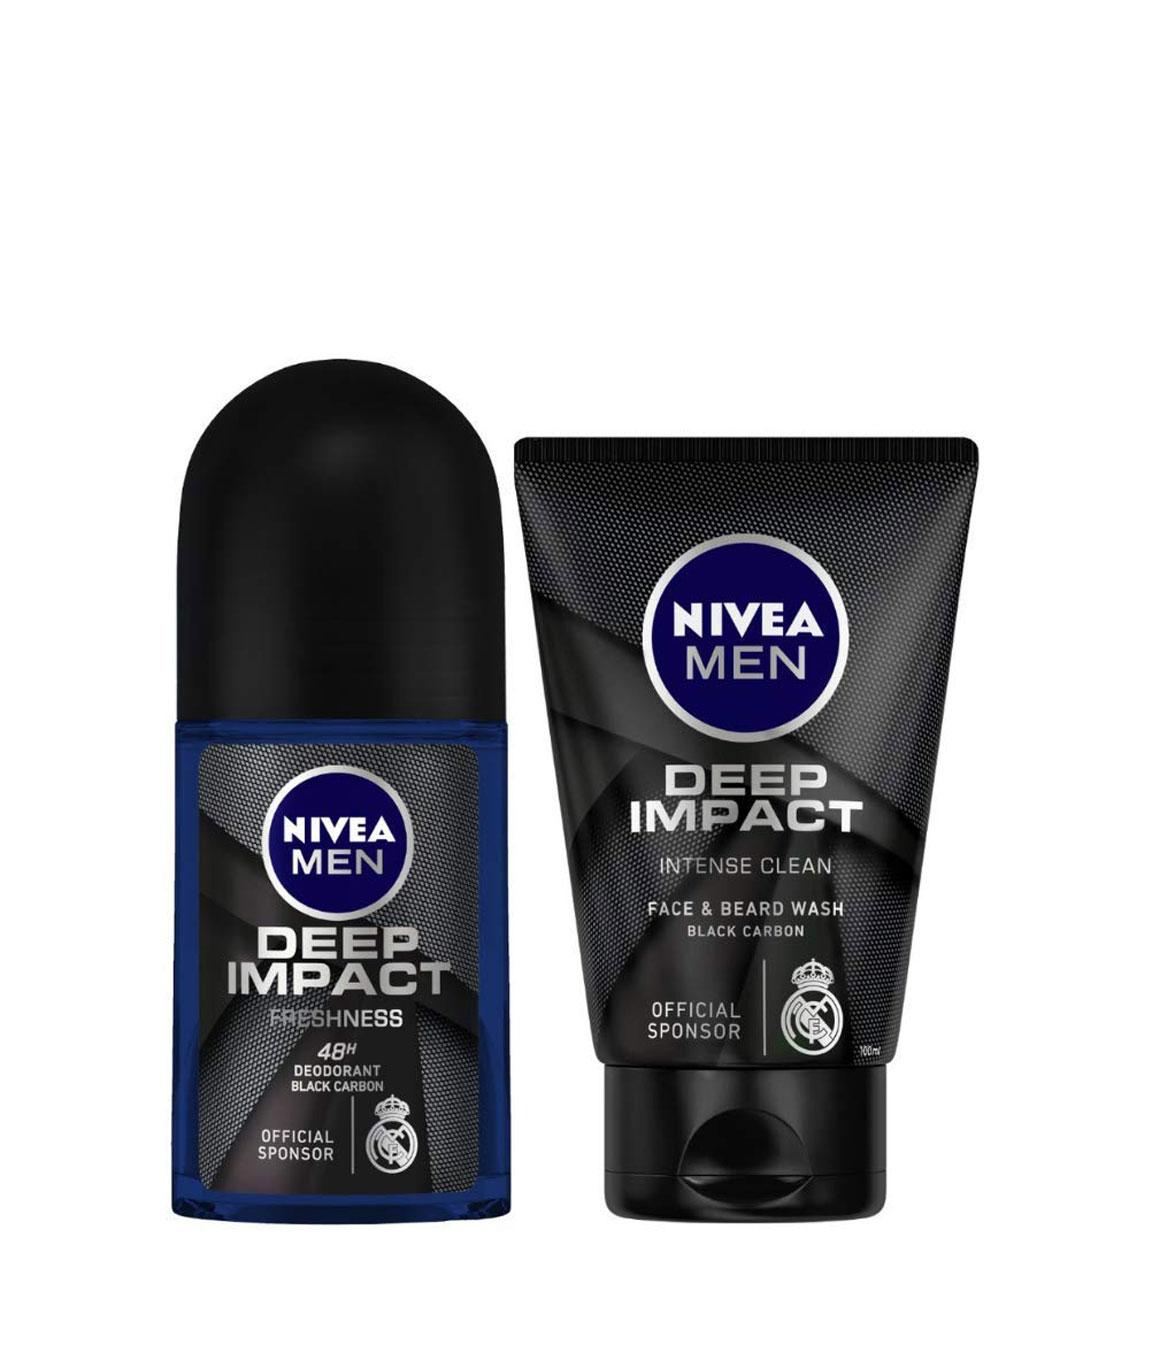 NIVEA MEN Deodorant Roll-on, Deep Impact Freshness, 50ml and NIVEA MEN Face & Beard Wash, Deep Impact Intense Clean, 100ml